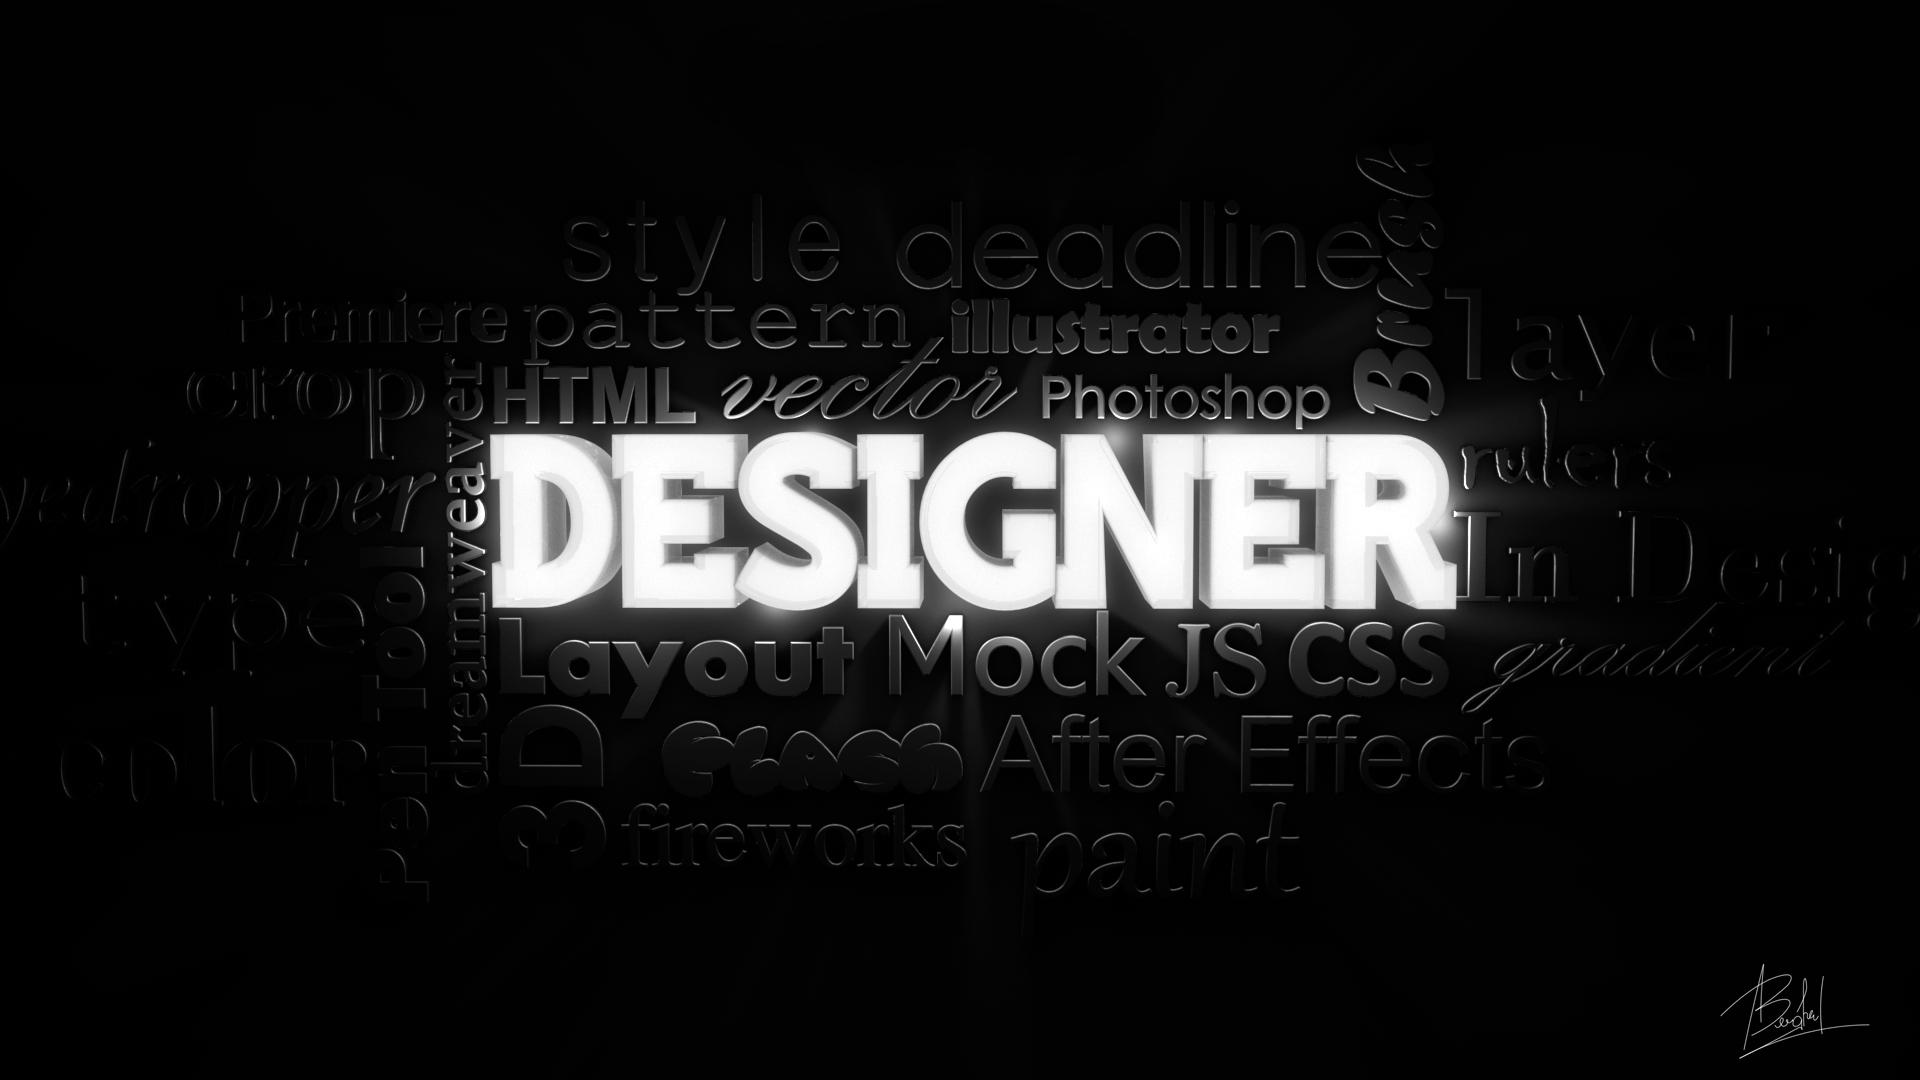 designer wallpaper art 1920x1080 1920x1080